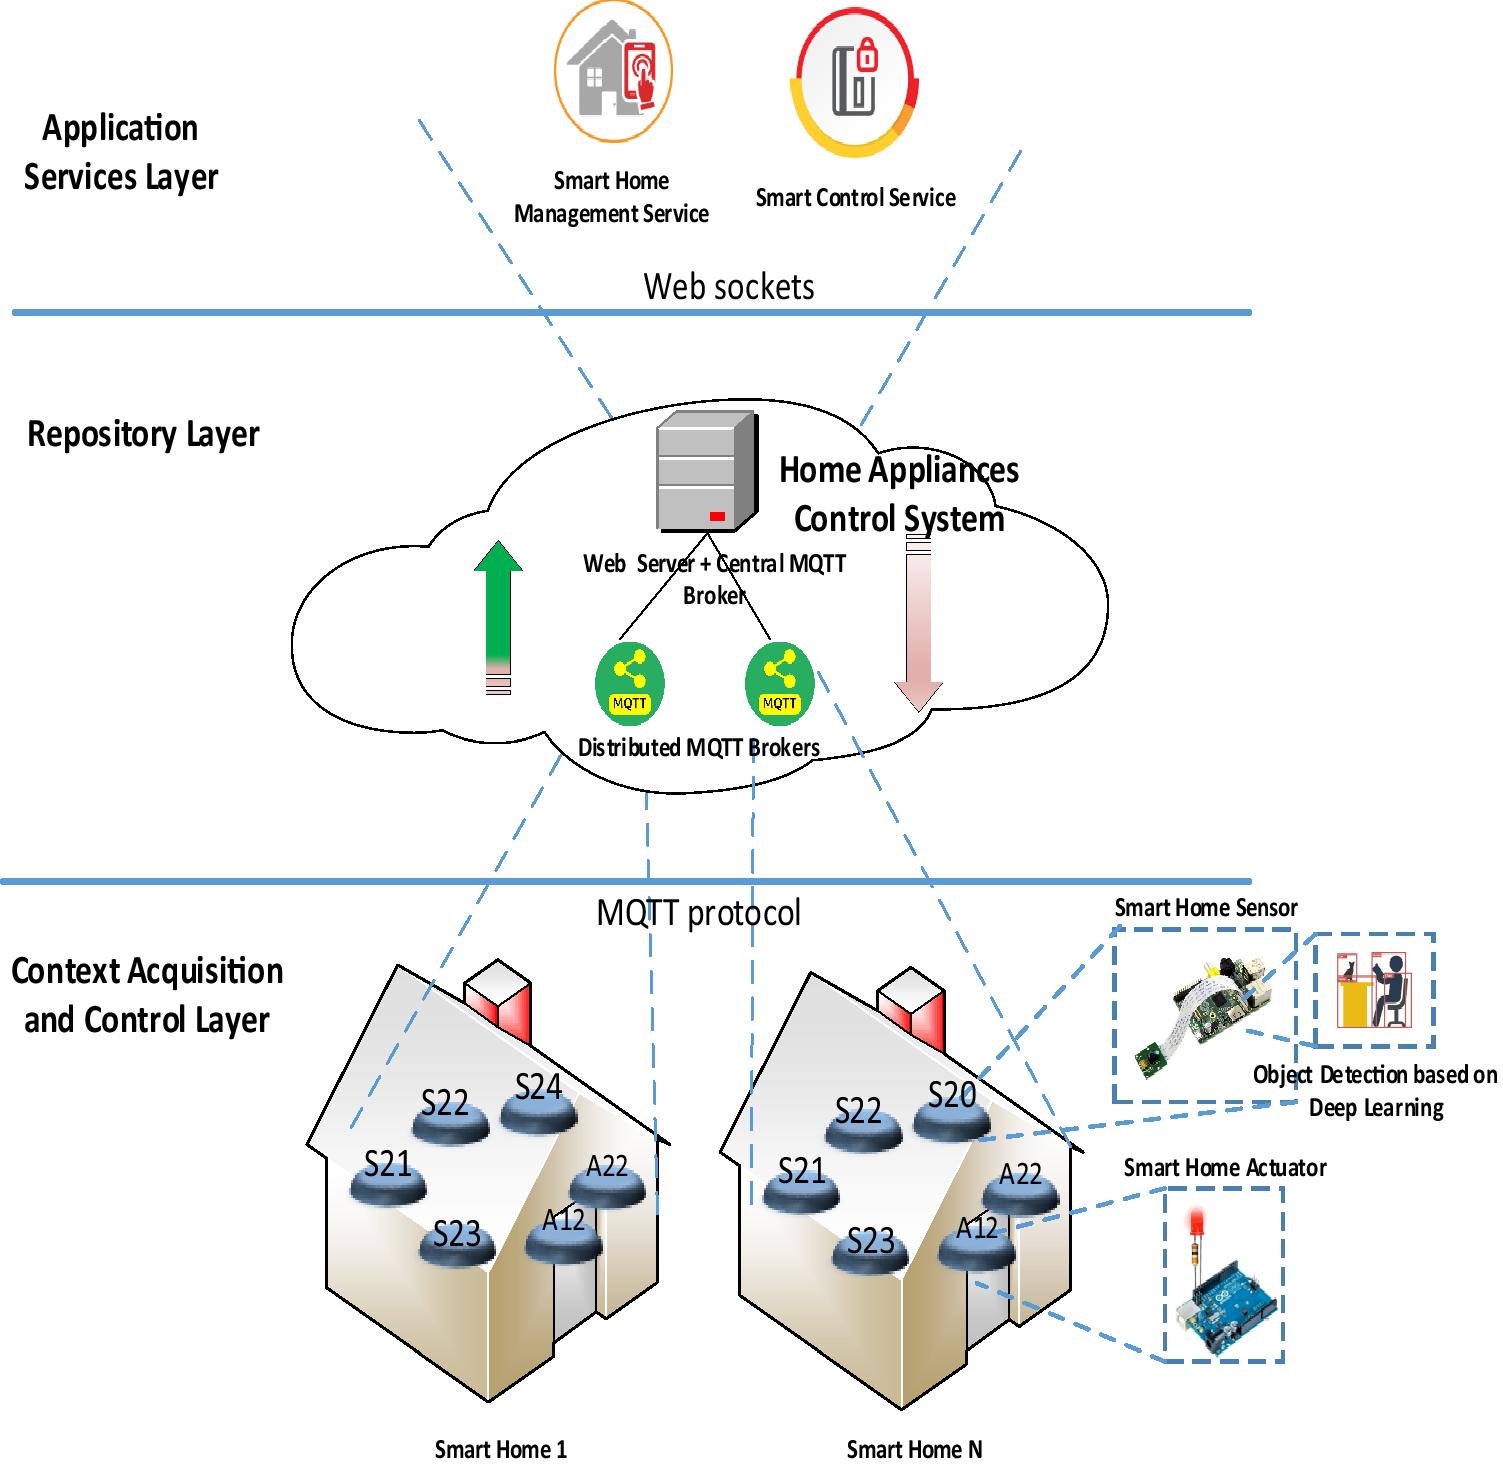 Object detection mechanism based on deep learning algorithm using